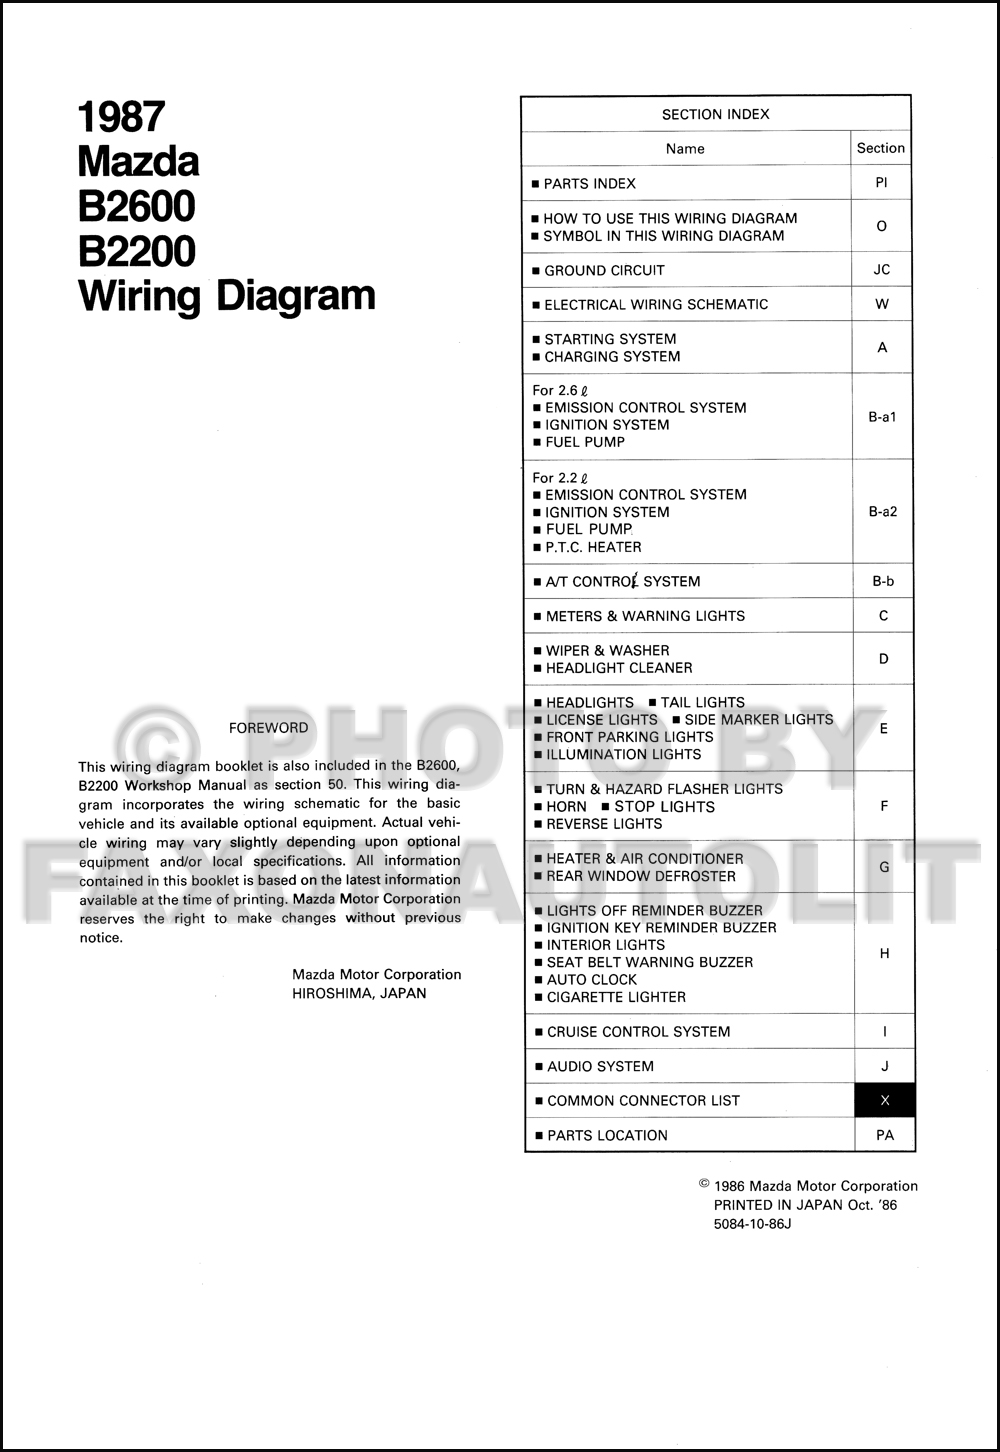 1987MazdaB2600B2200OWD TOC 1987 mazda b2200 b2600 pickup truck wiring diagram manual original Mazda B2200 Engine Wiring at gsmx.co